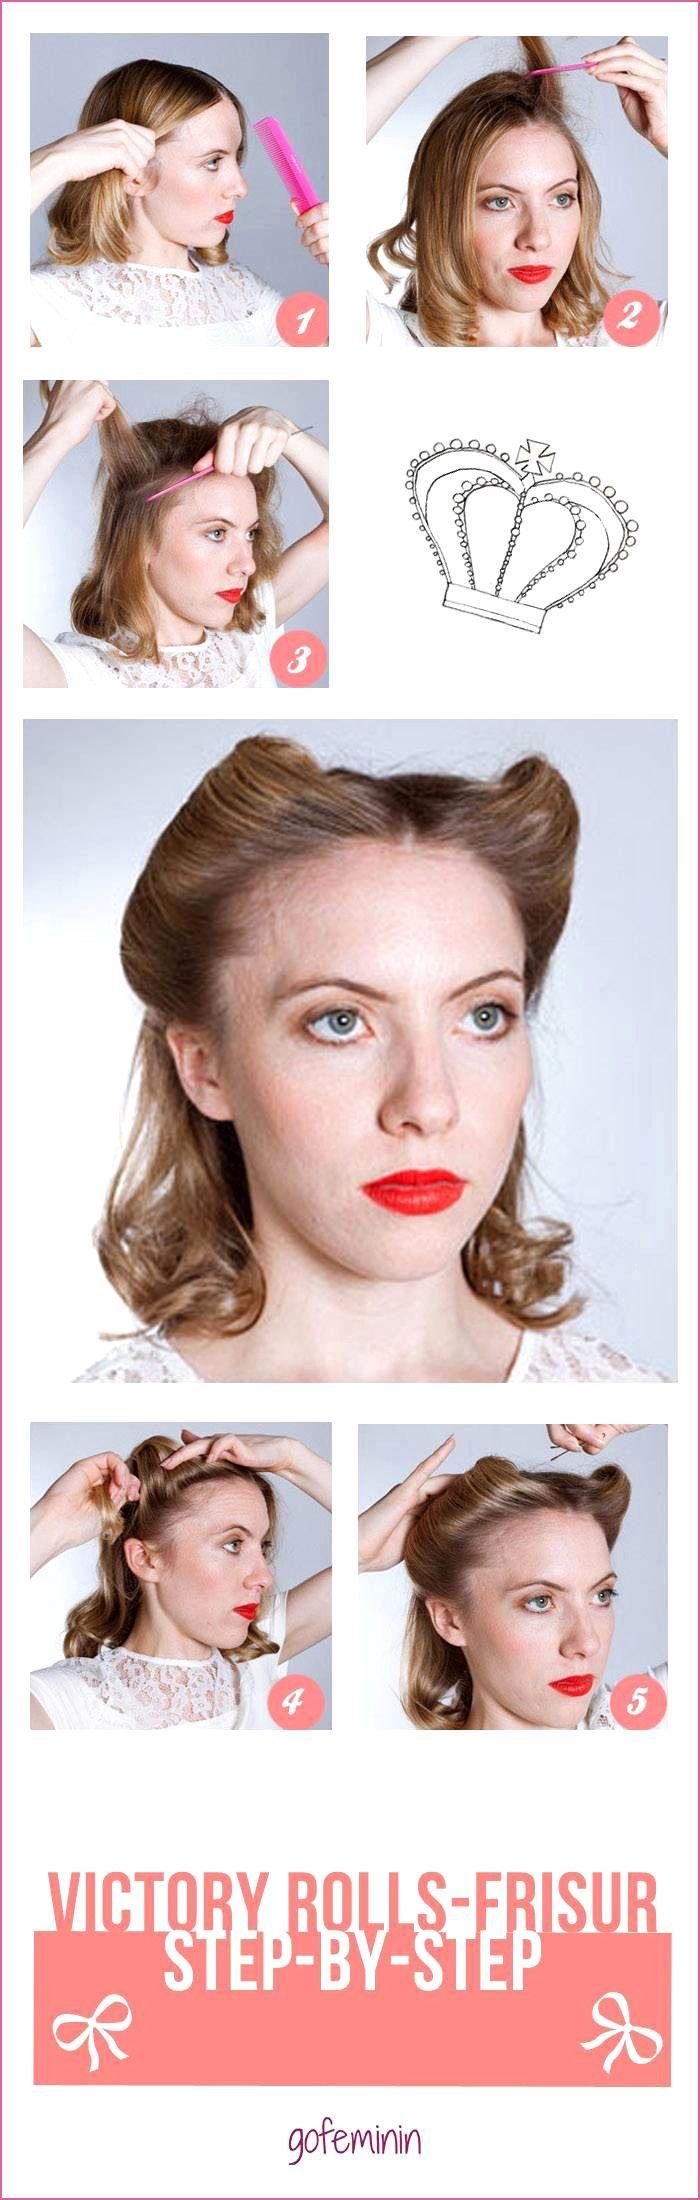 Haarband Frisuren Offen Festlichekurzhaarfrisuren Frisuren Haarband Offen In 2020 Hairband Hairstyle Hair Styles Roll Hairstyle